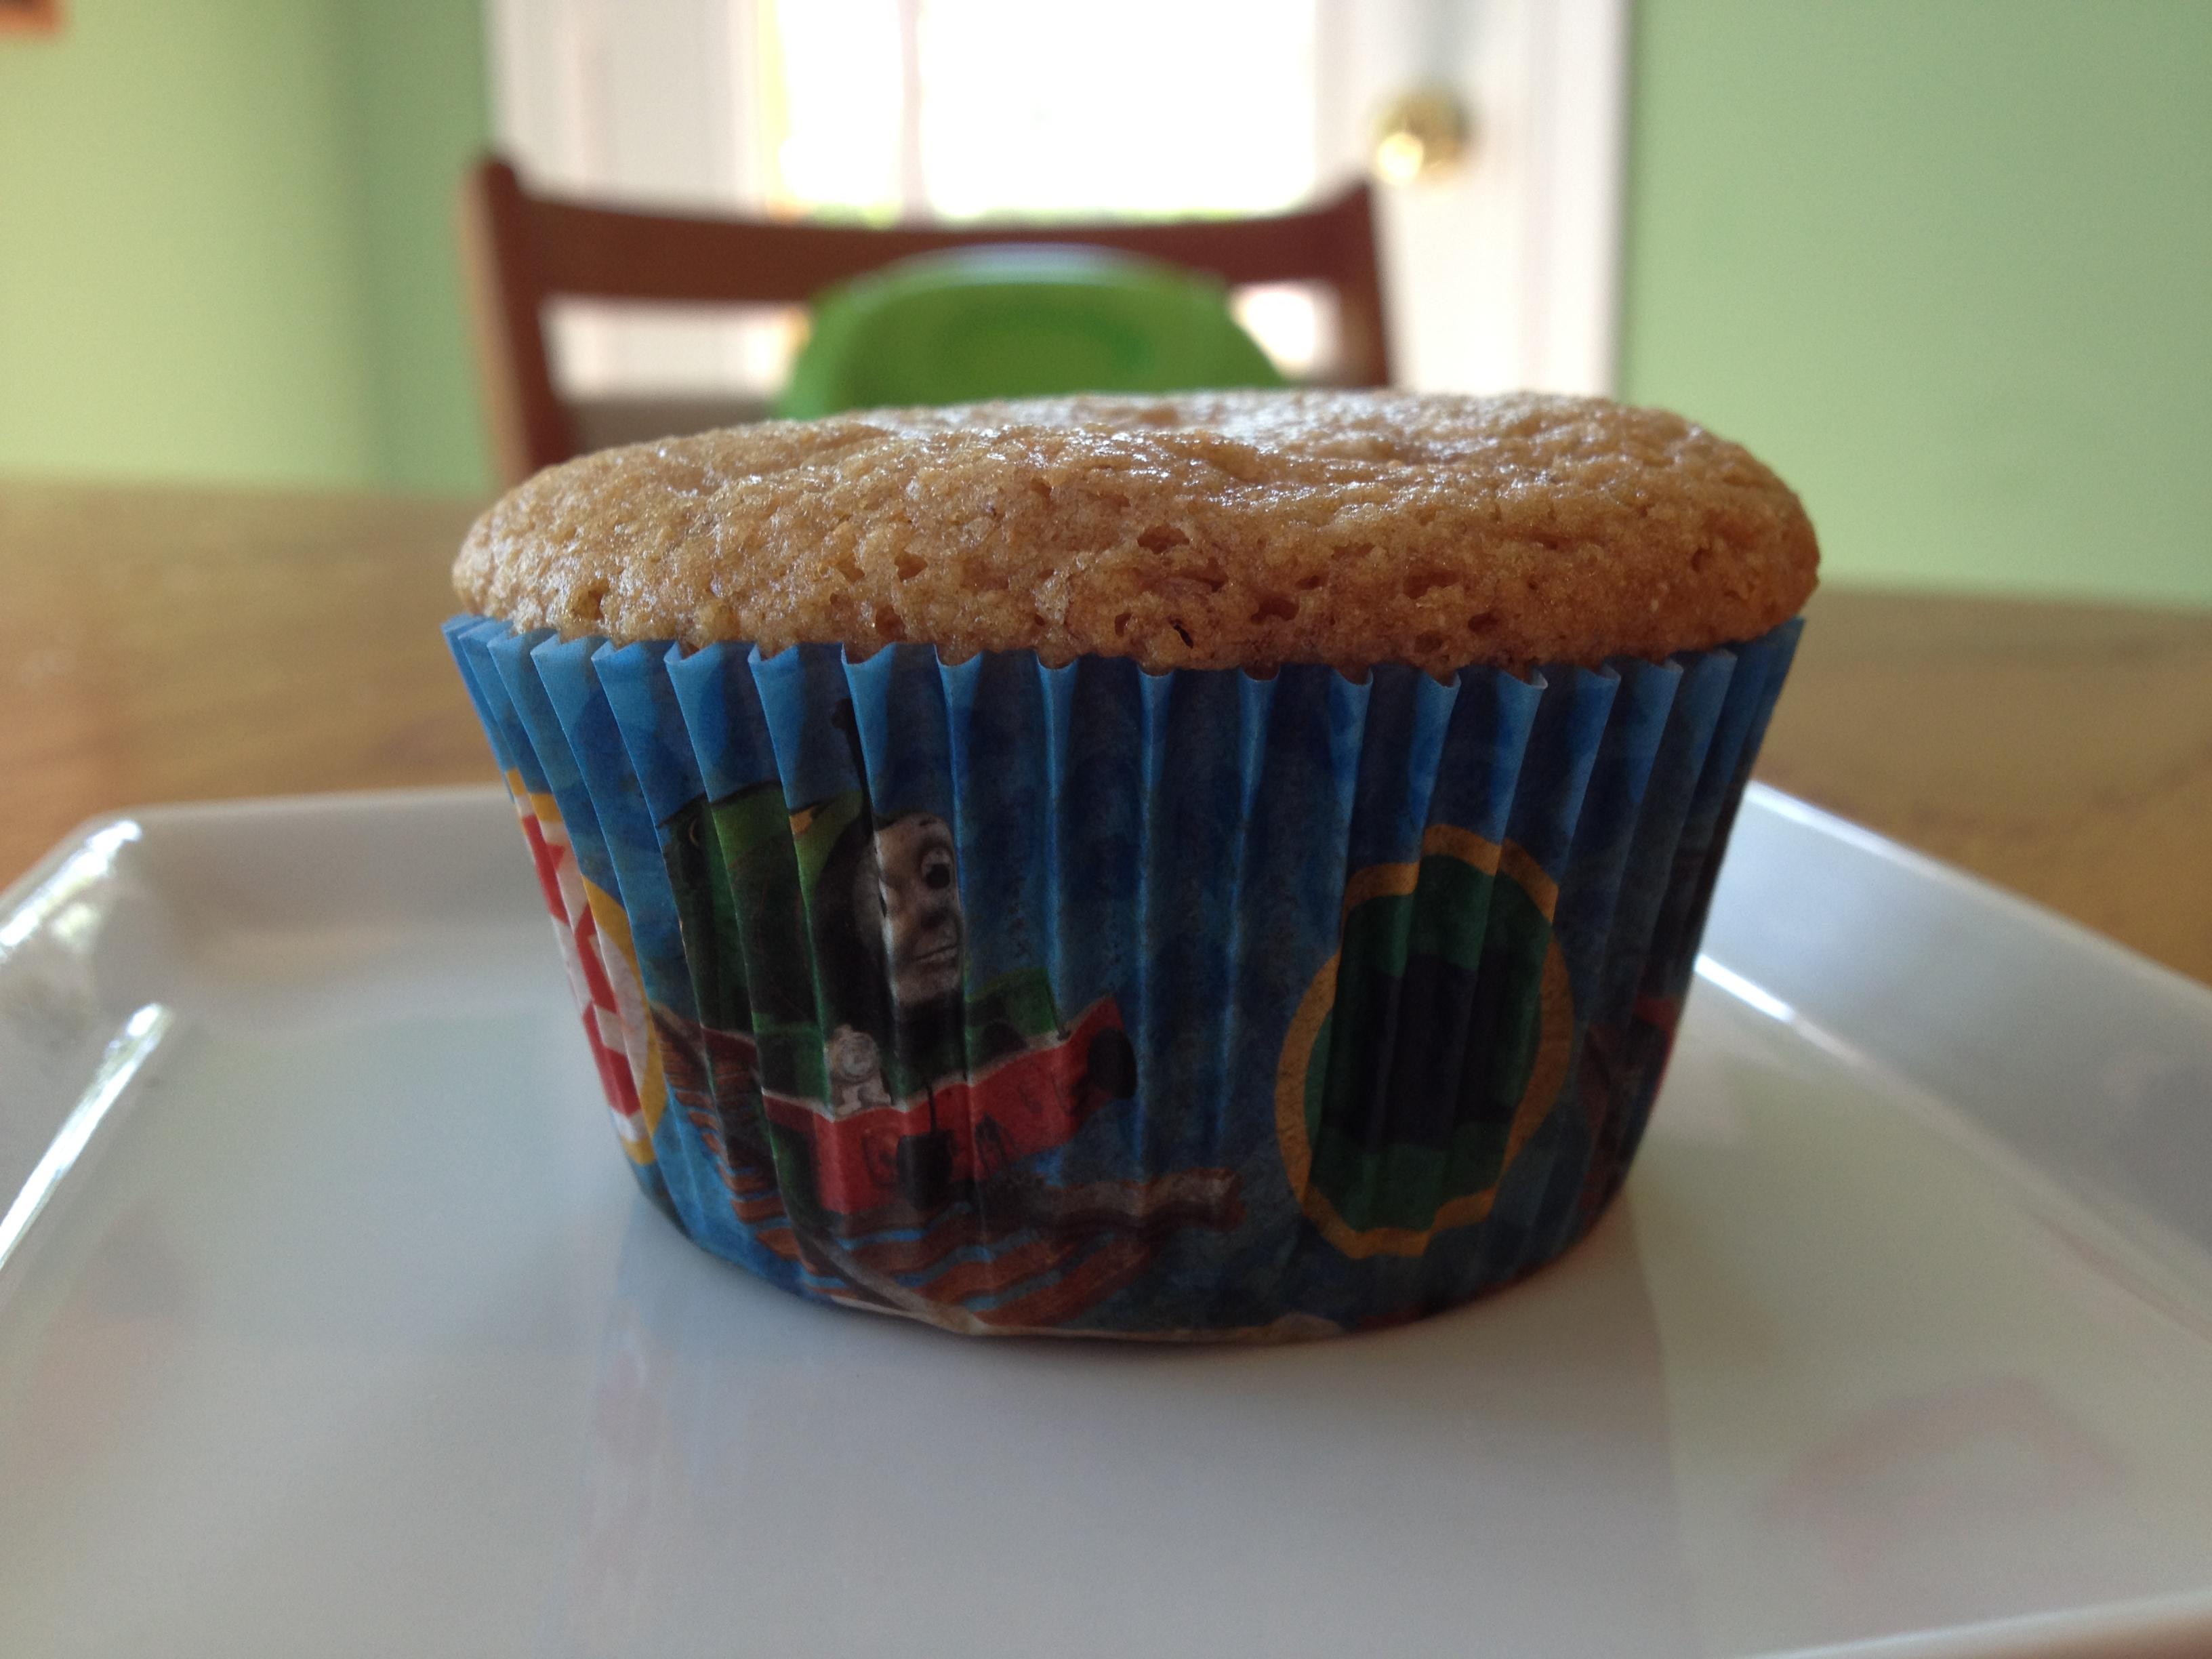 Banana Muffins: Just like Grandma used to make.